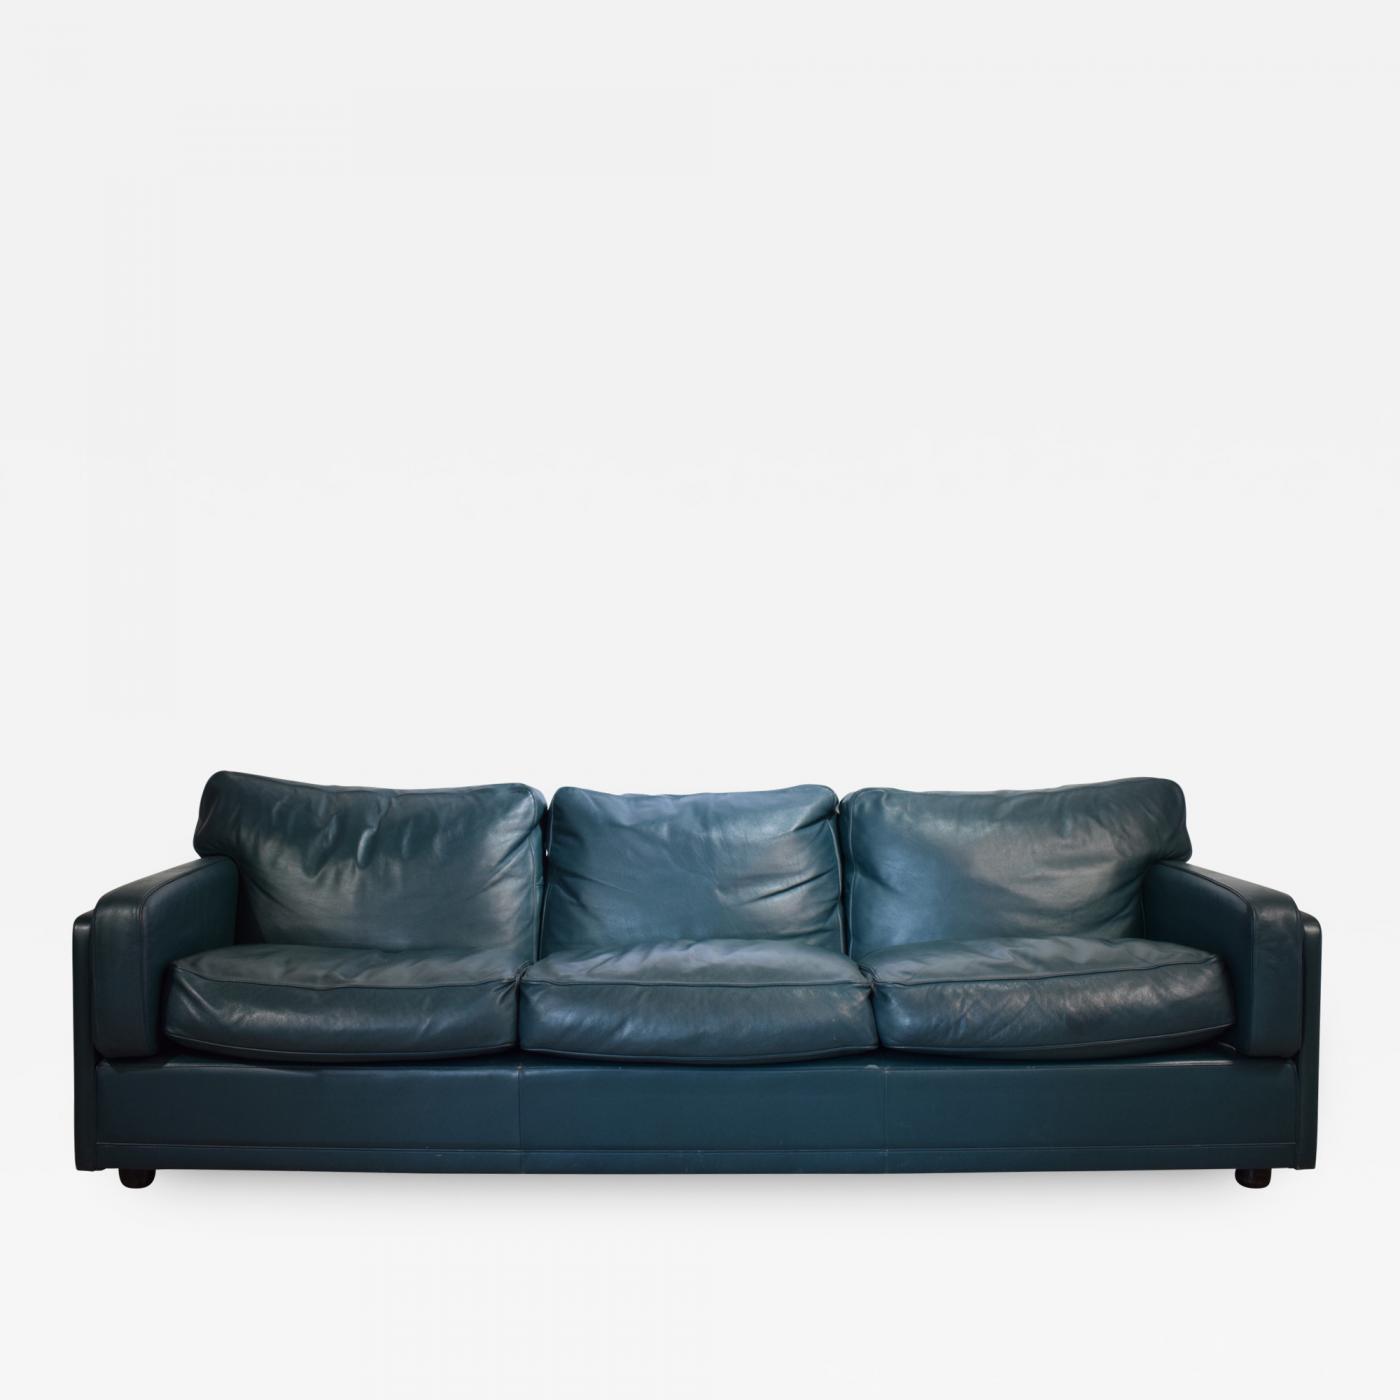 Poltrona Frau.Poltrona Frau Socrate Three Seat Sofa In Green Petrol Leather